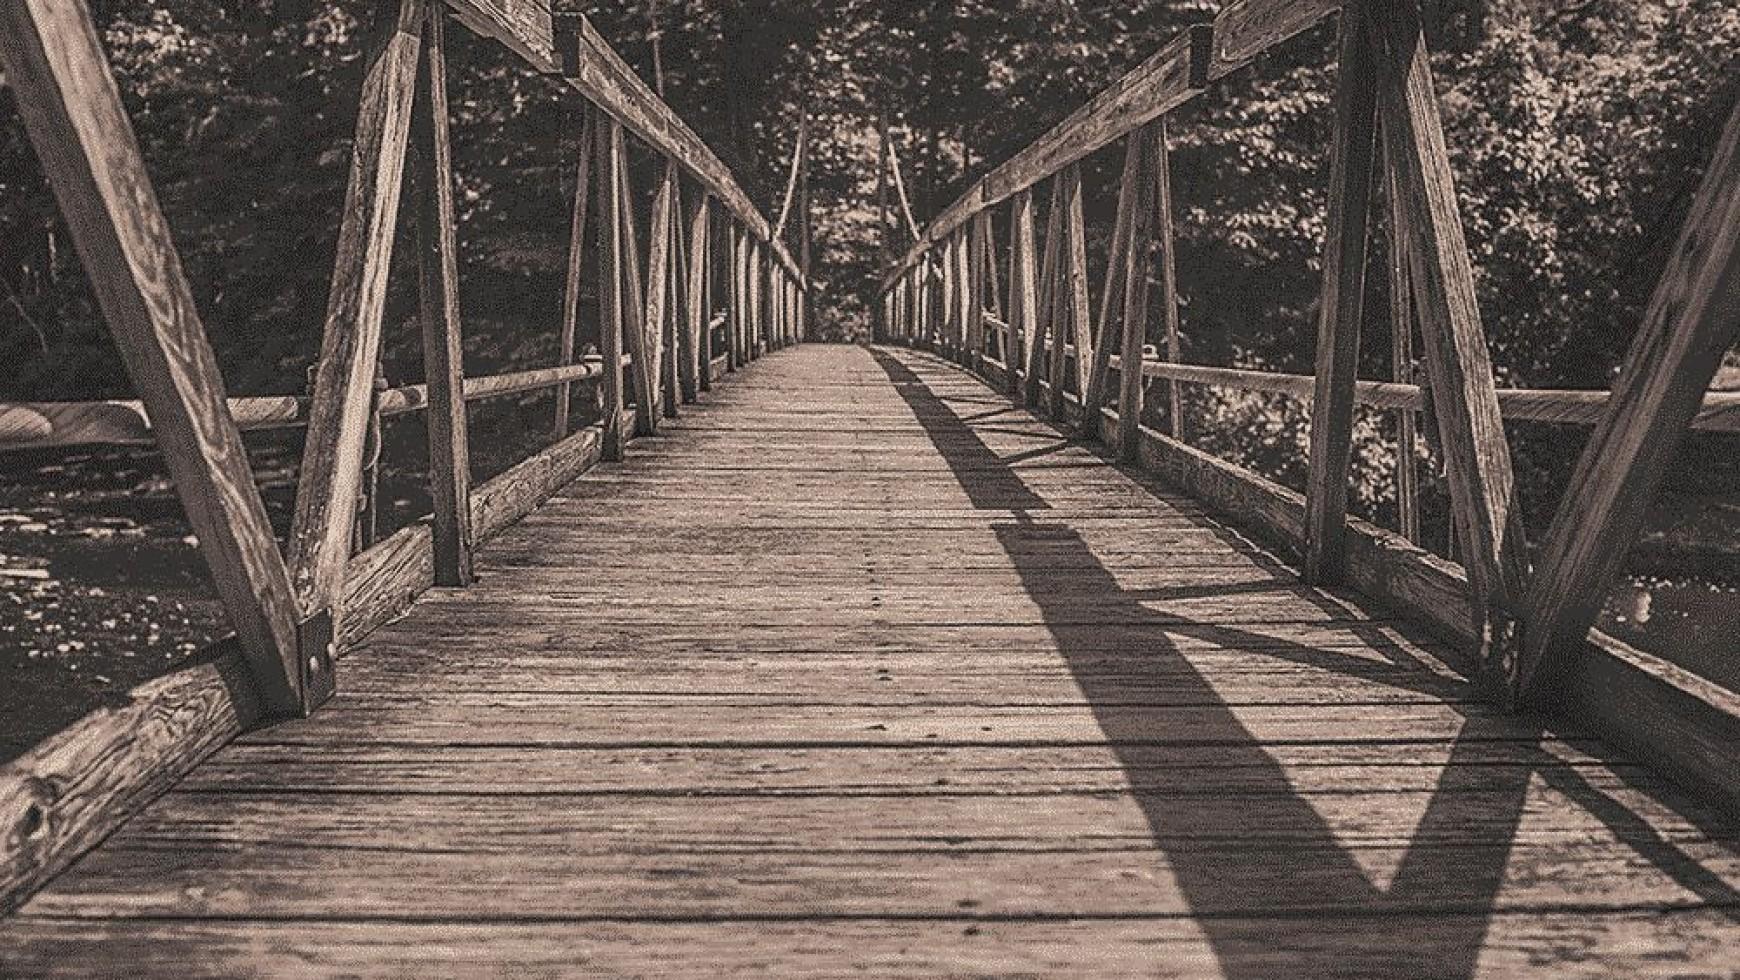 bridge-straight-wooden-2257.jpg